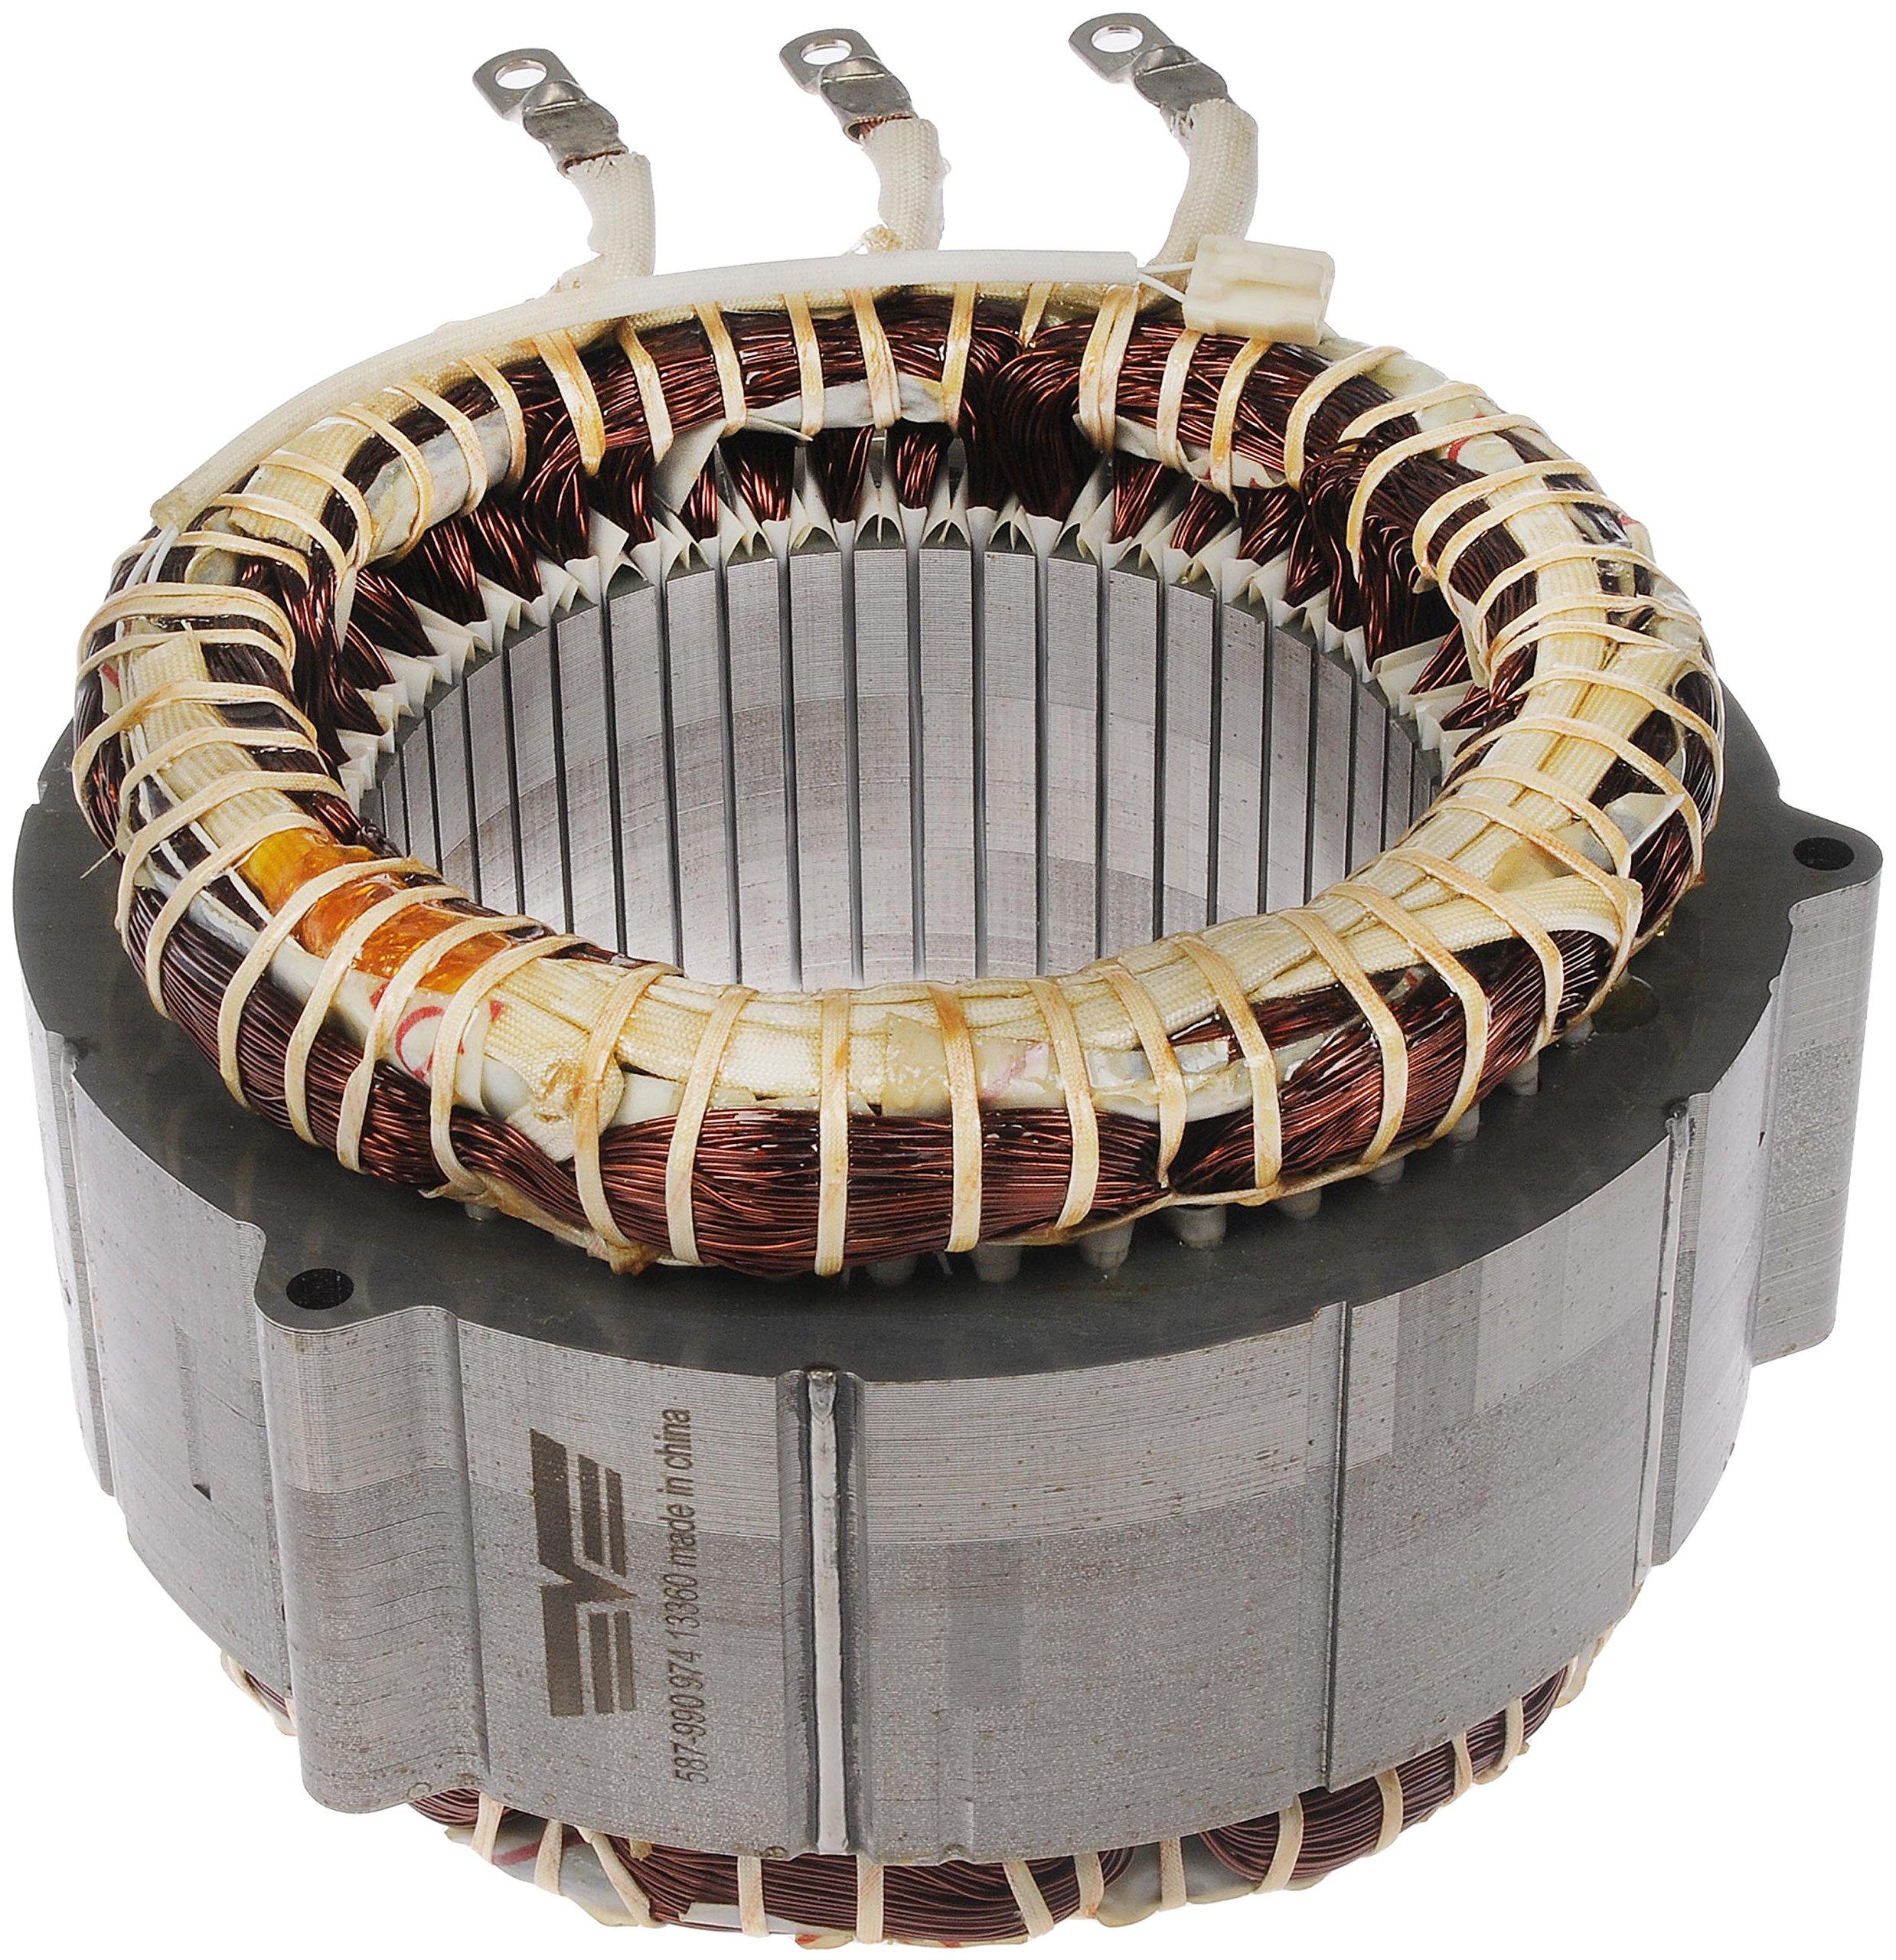 Dorman 587-990 Transmission Stator by Dorman